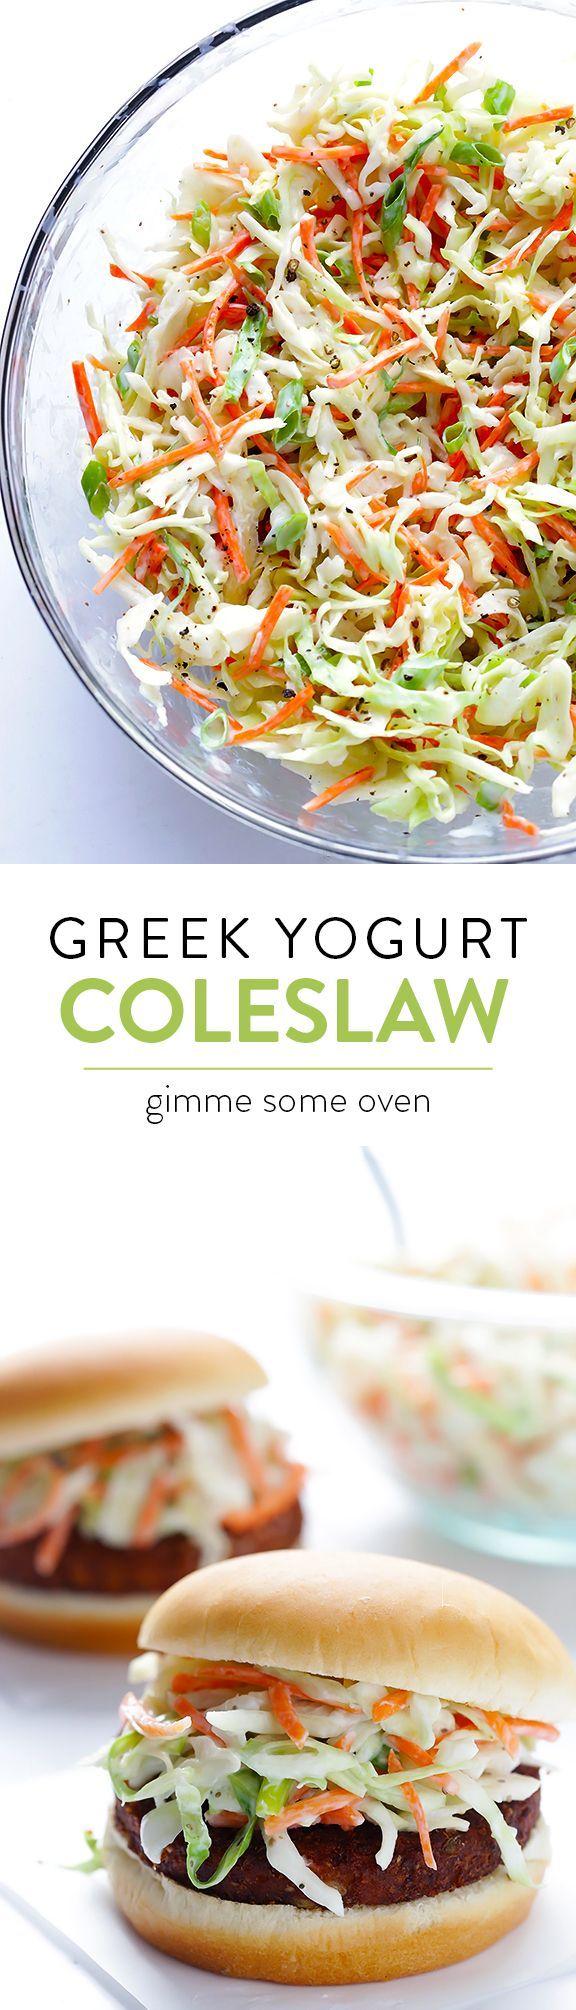 Coleslaw clipart example go food Pinterest  veggie ideas 25+